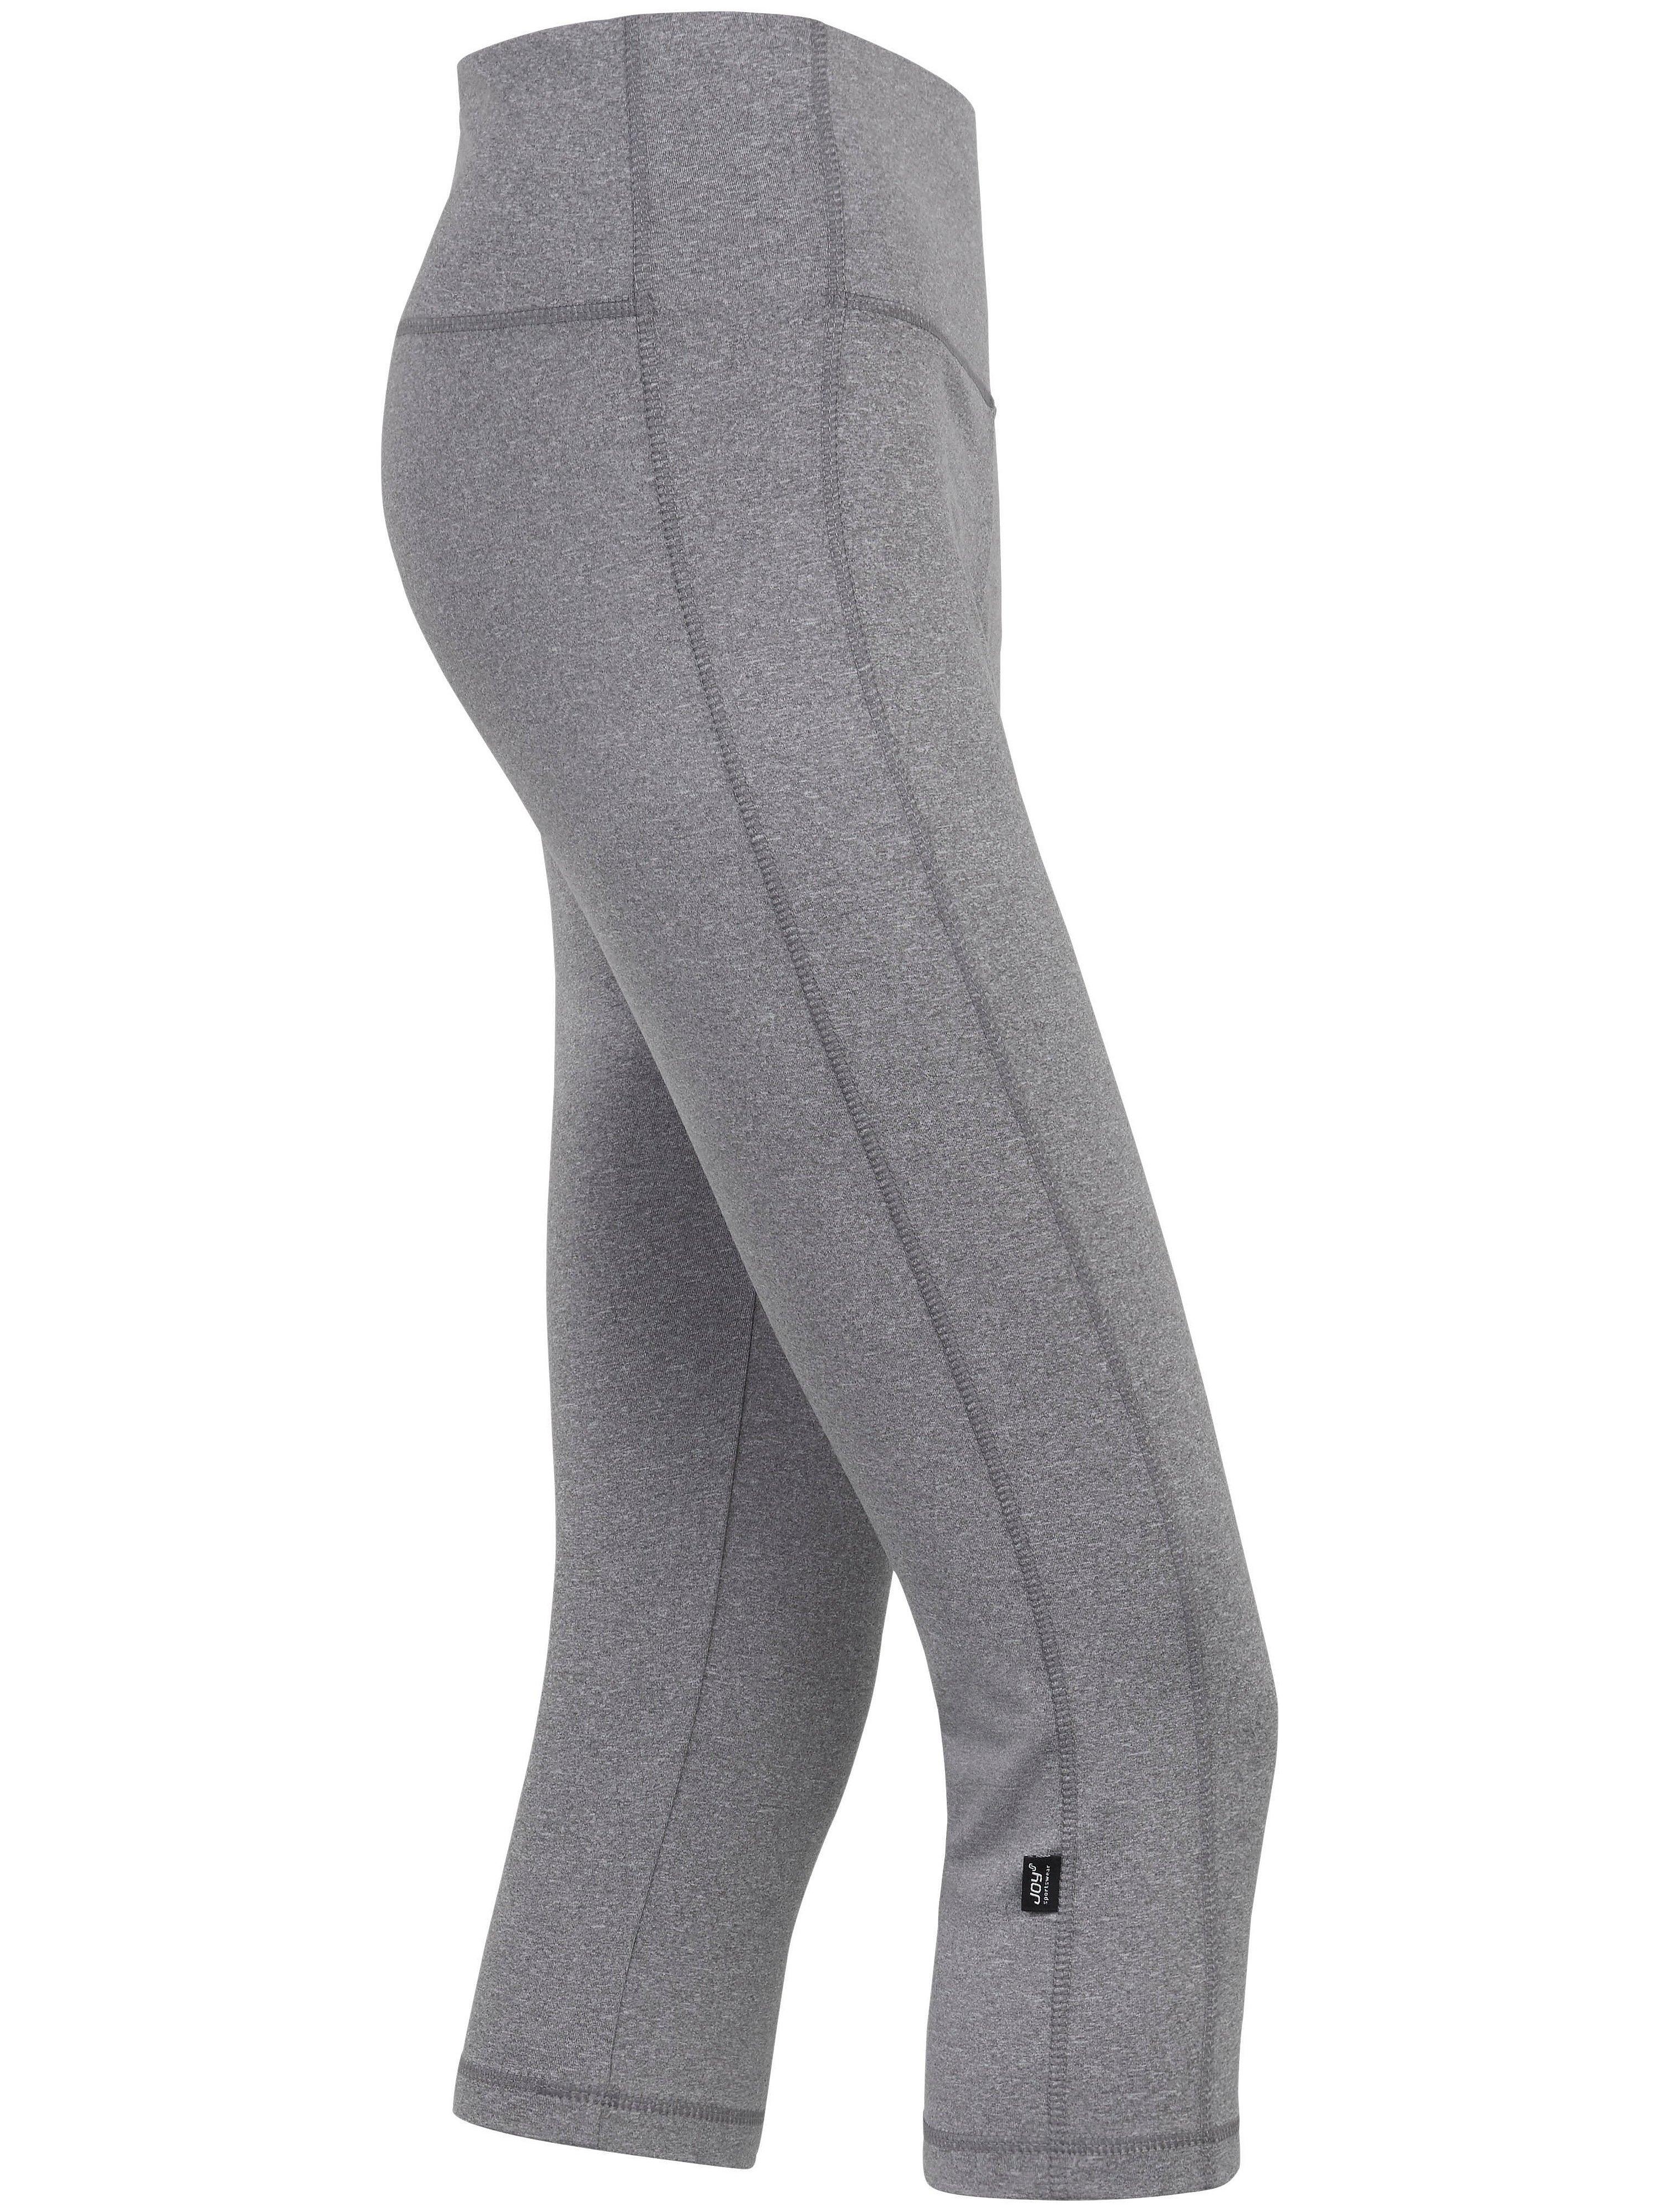 Capribuks 'BodyFit' Fra JOY Sportswear grå